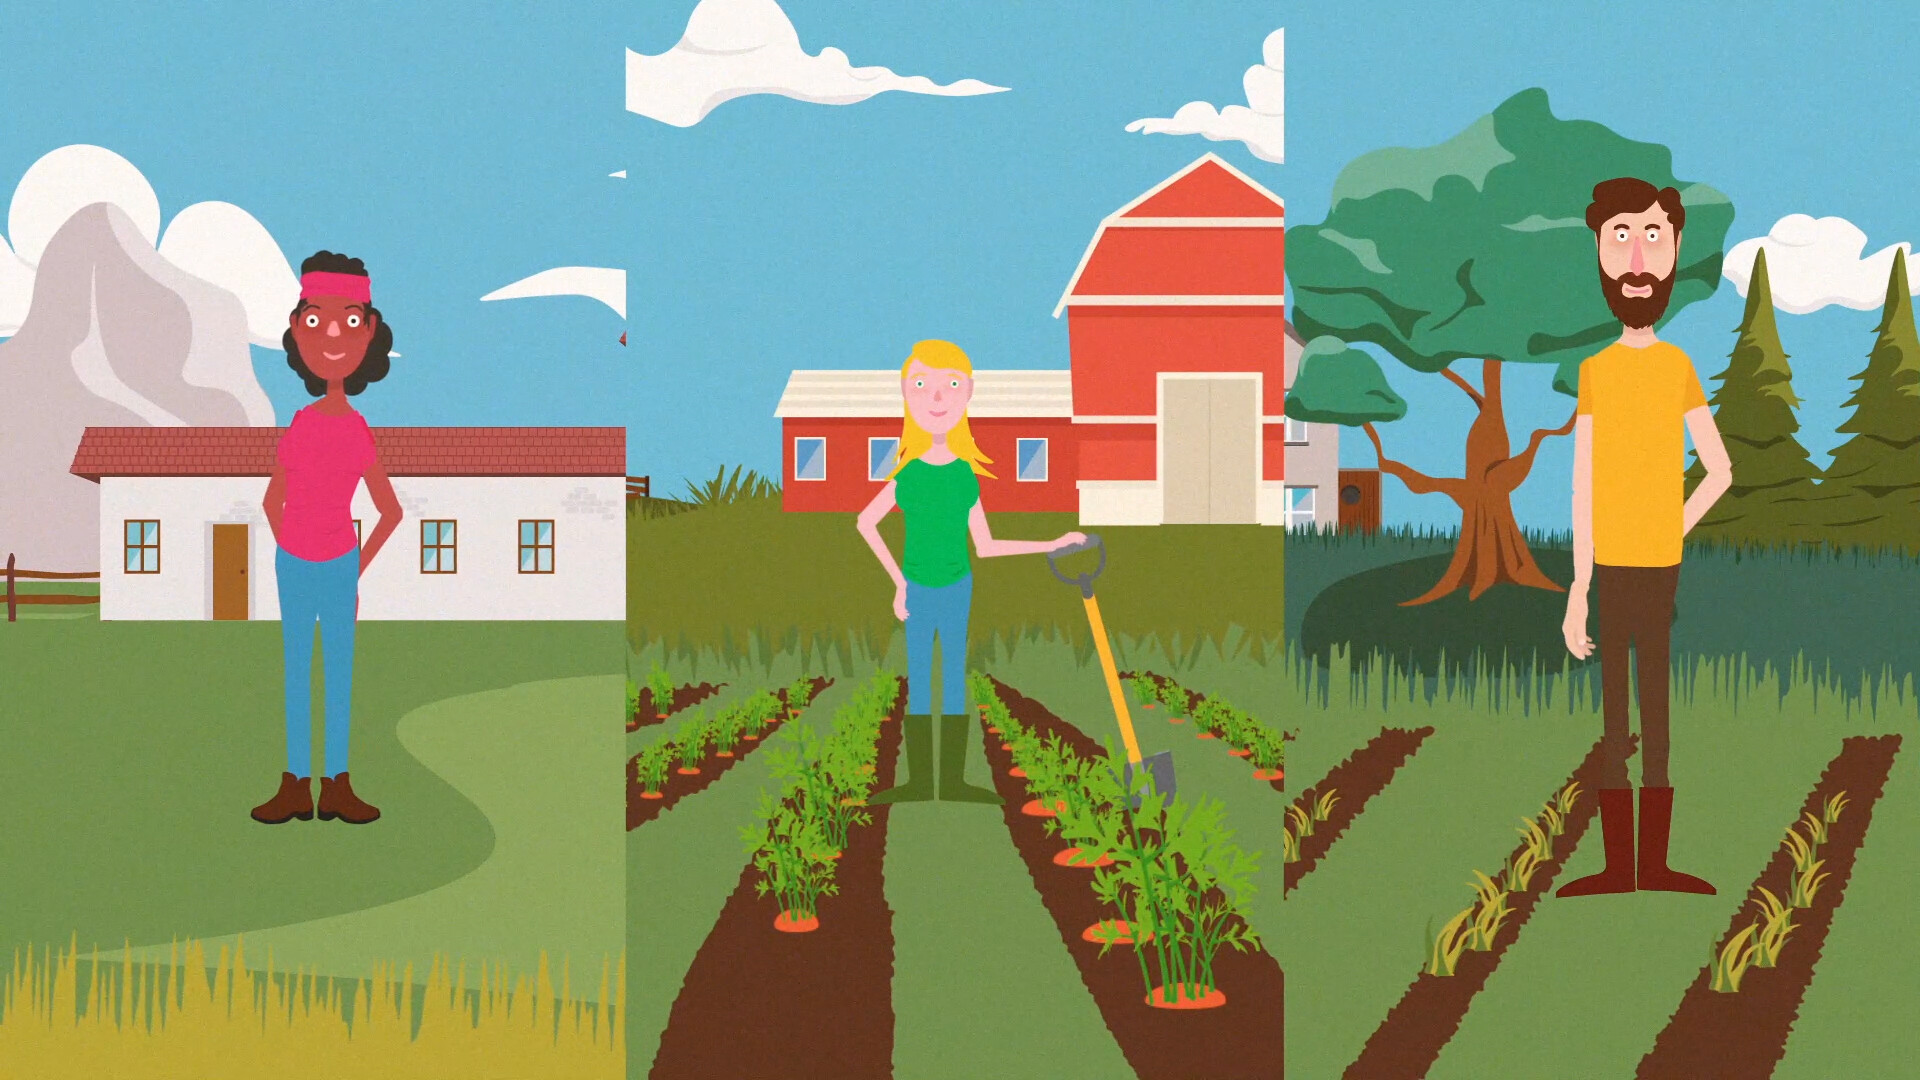 Matthieu vdk ifoam agriculture superheroes eng 01 no subtitles 5